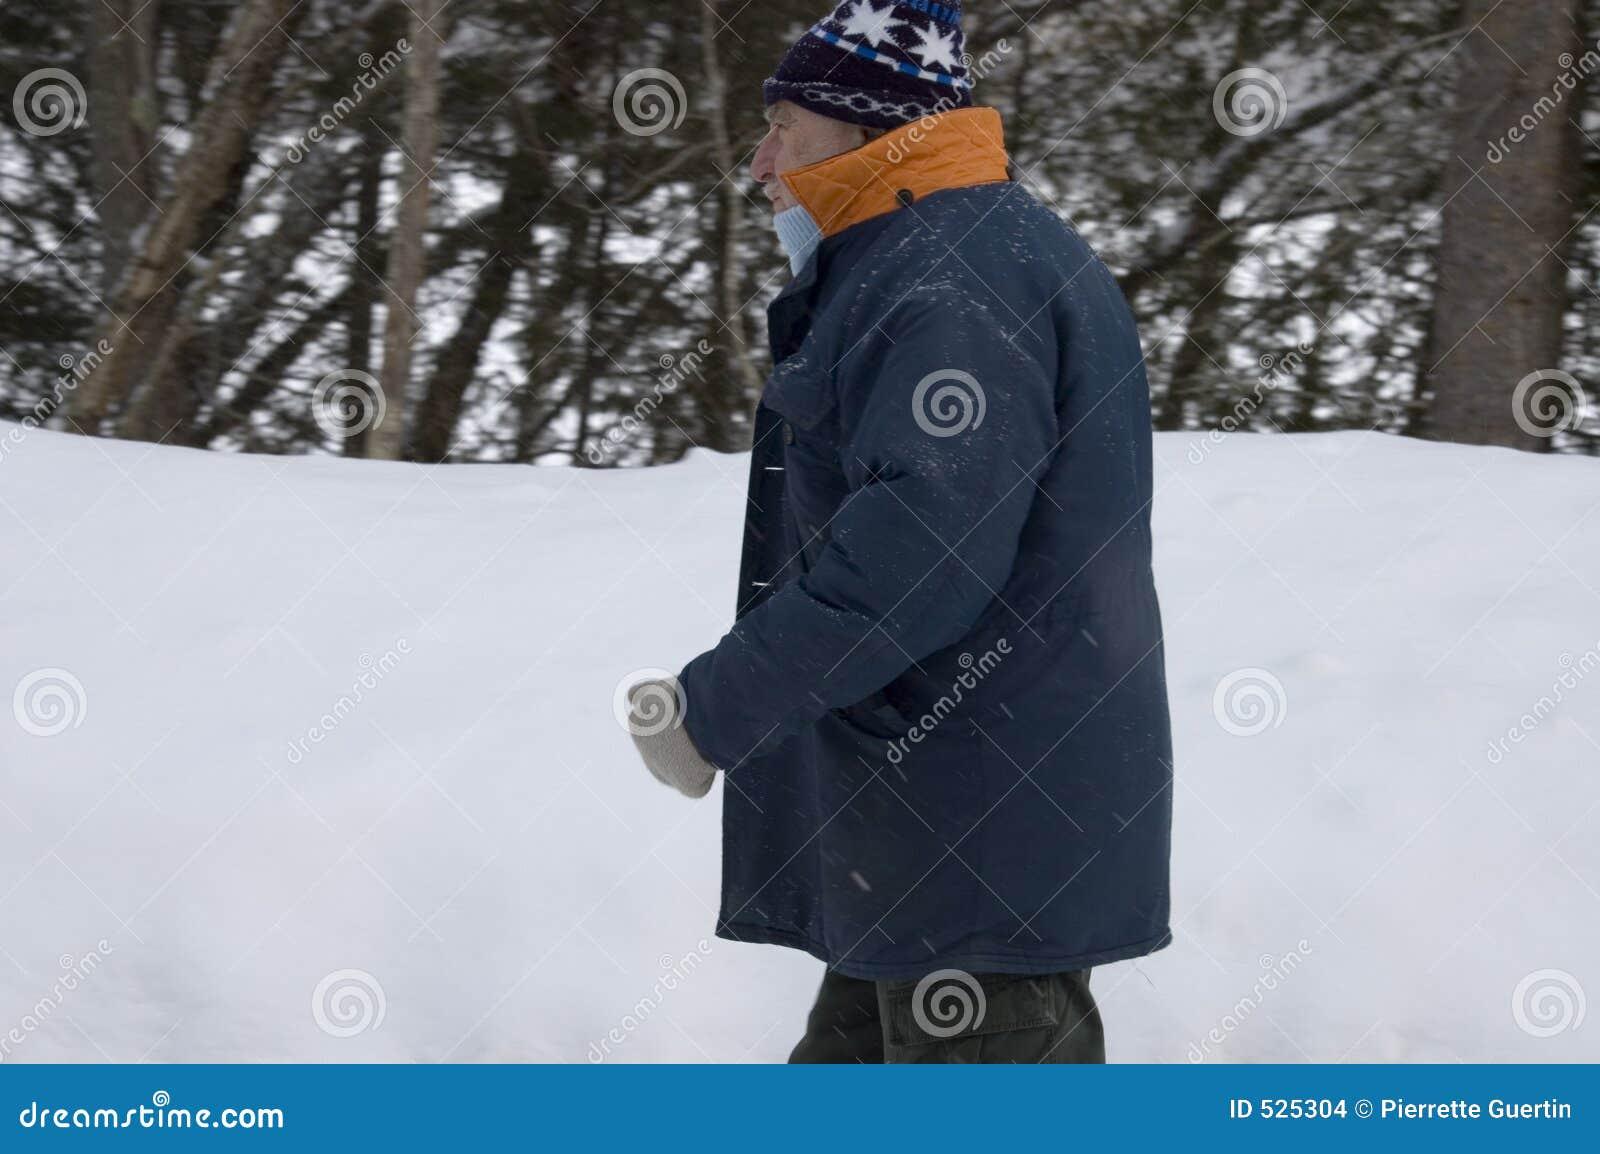 Download 高级雪风暴结构 库存照片. 图片 包括有 查找, 棍子, 祖父, 冬天, 集中, 风暴, 生活方式, 表面, 暂挂 - 525304